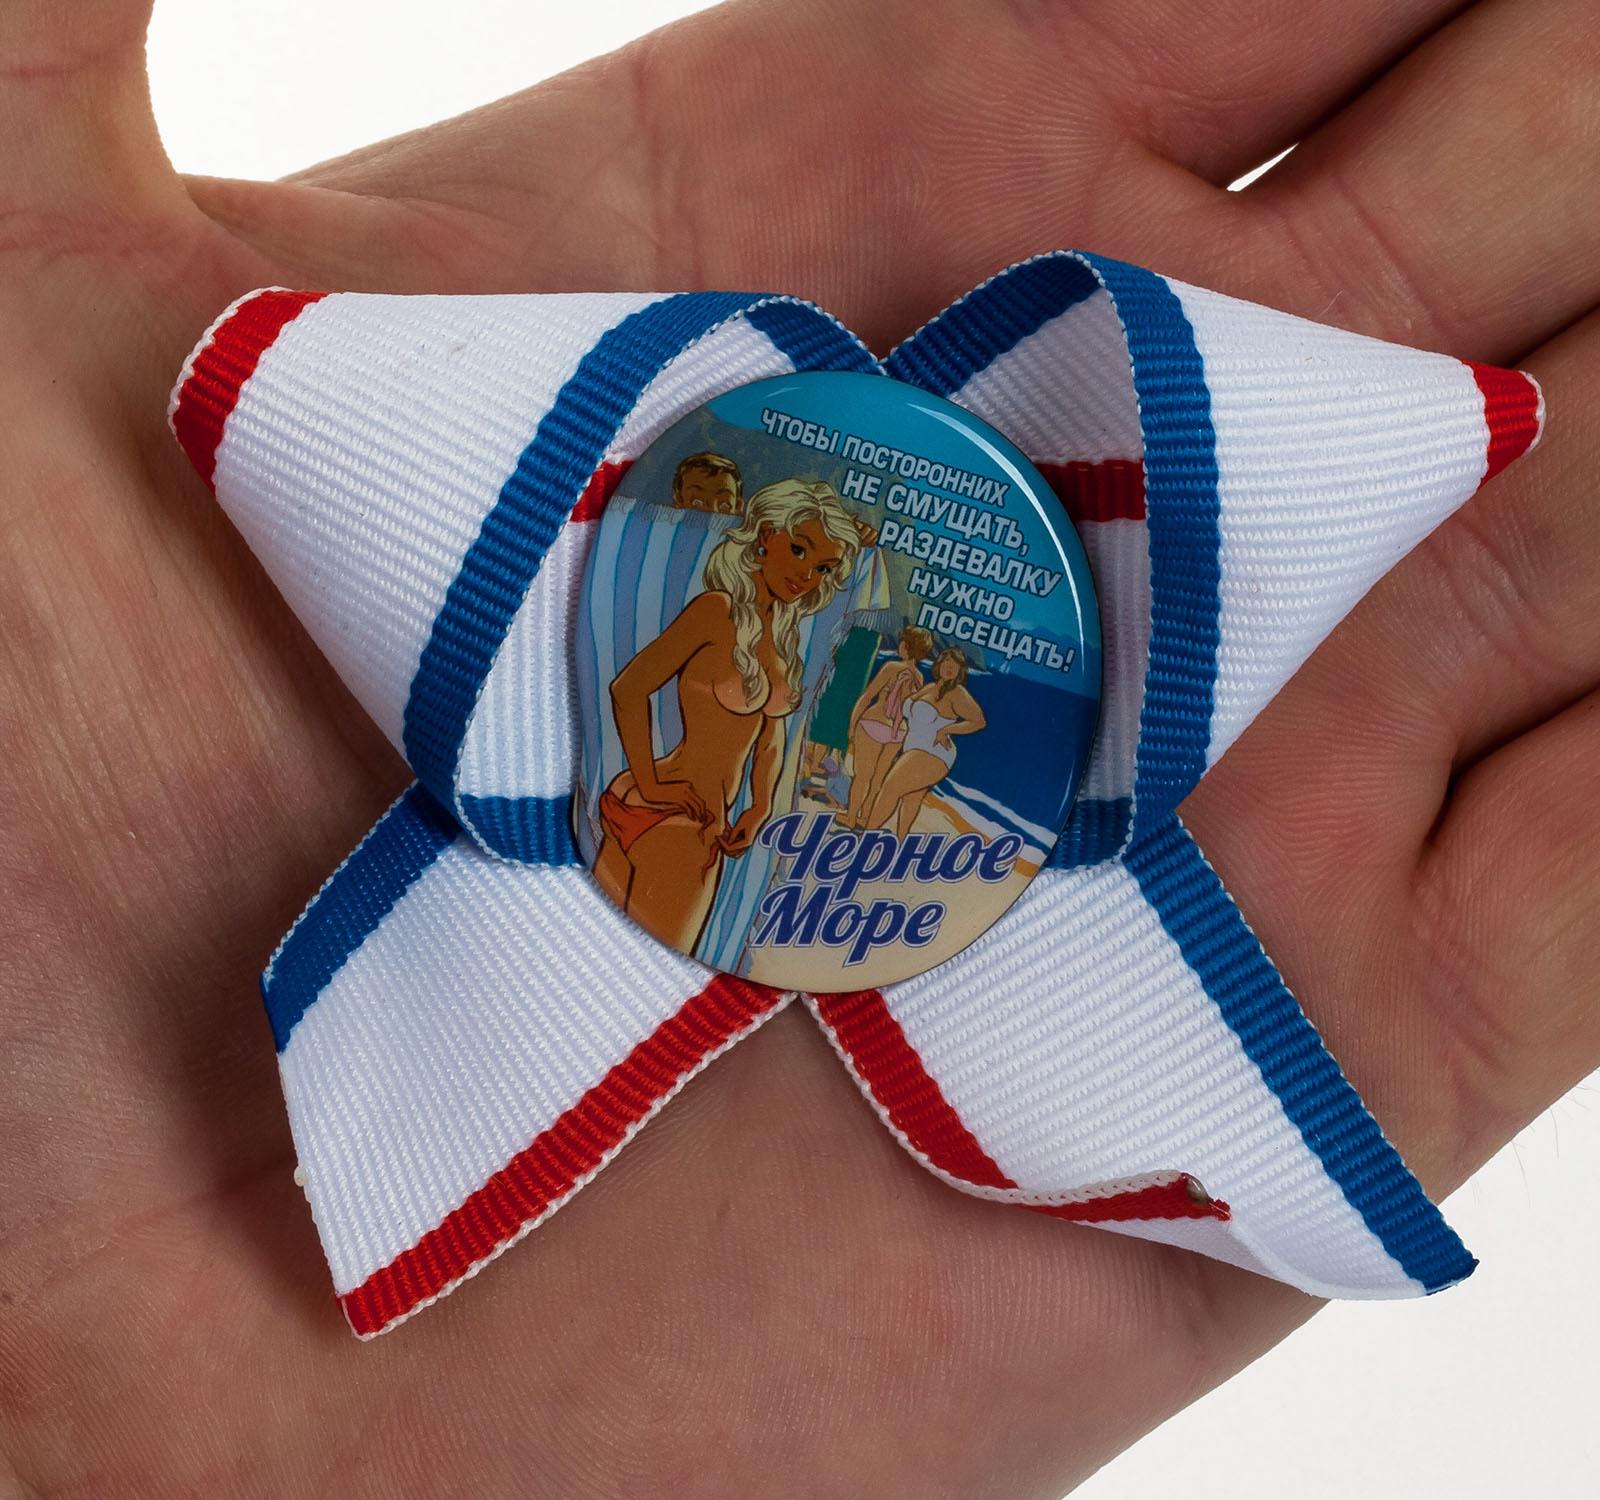 Крымские значки по низким ценам онлайн с доставкой